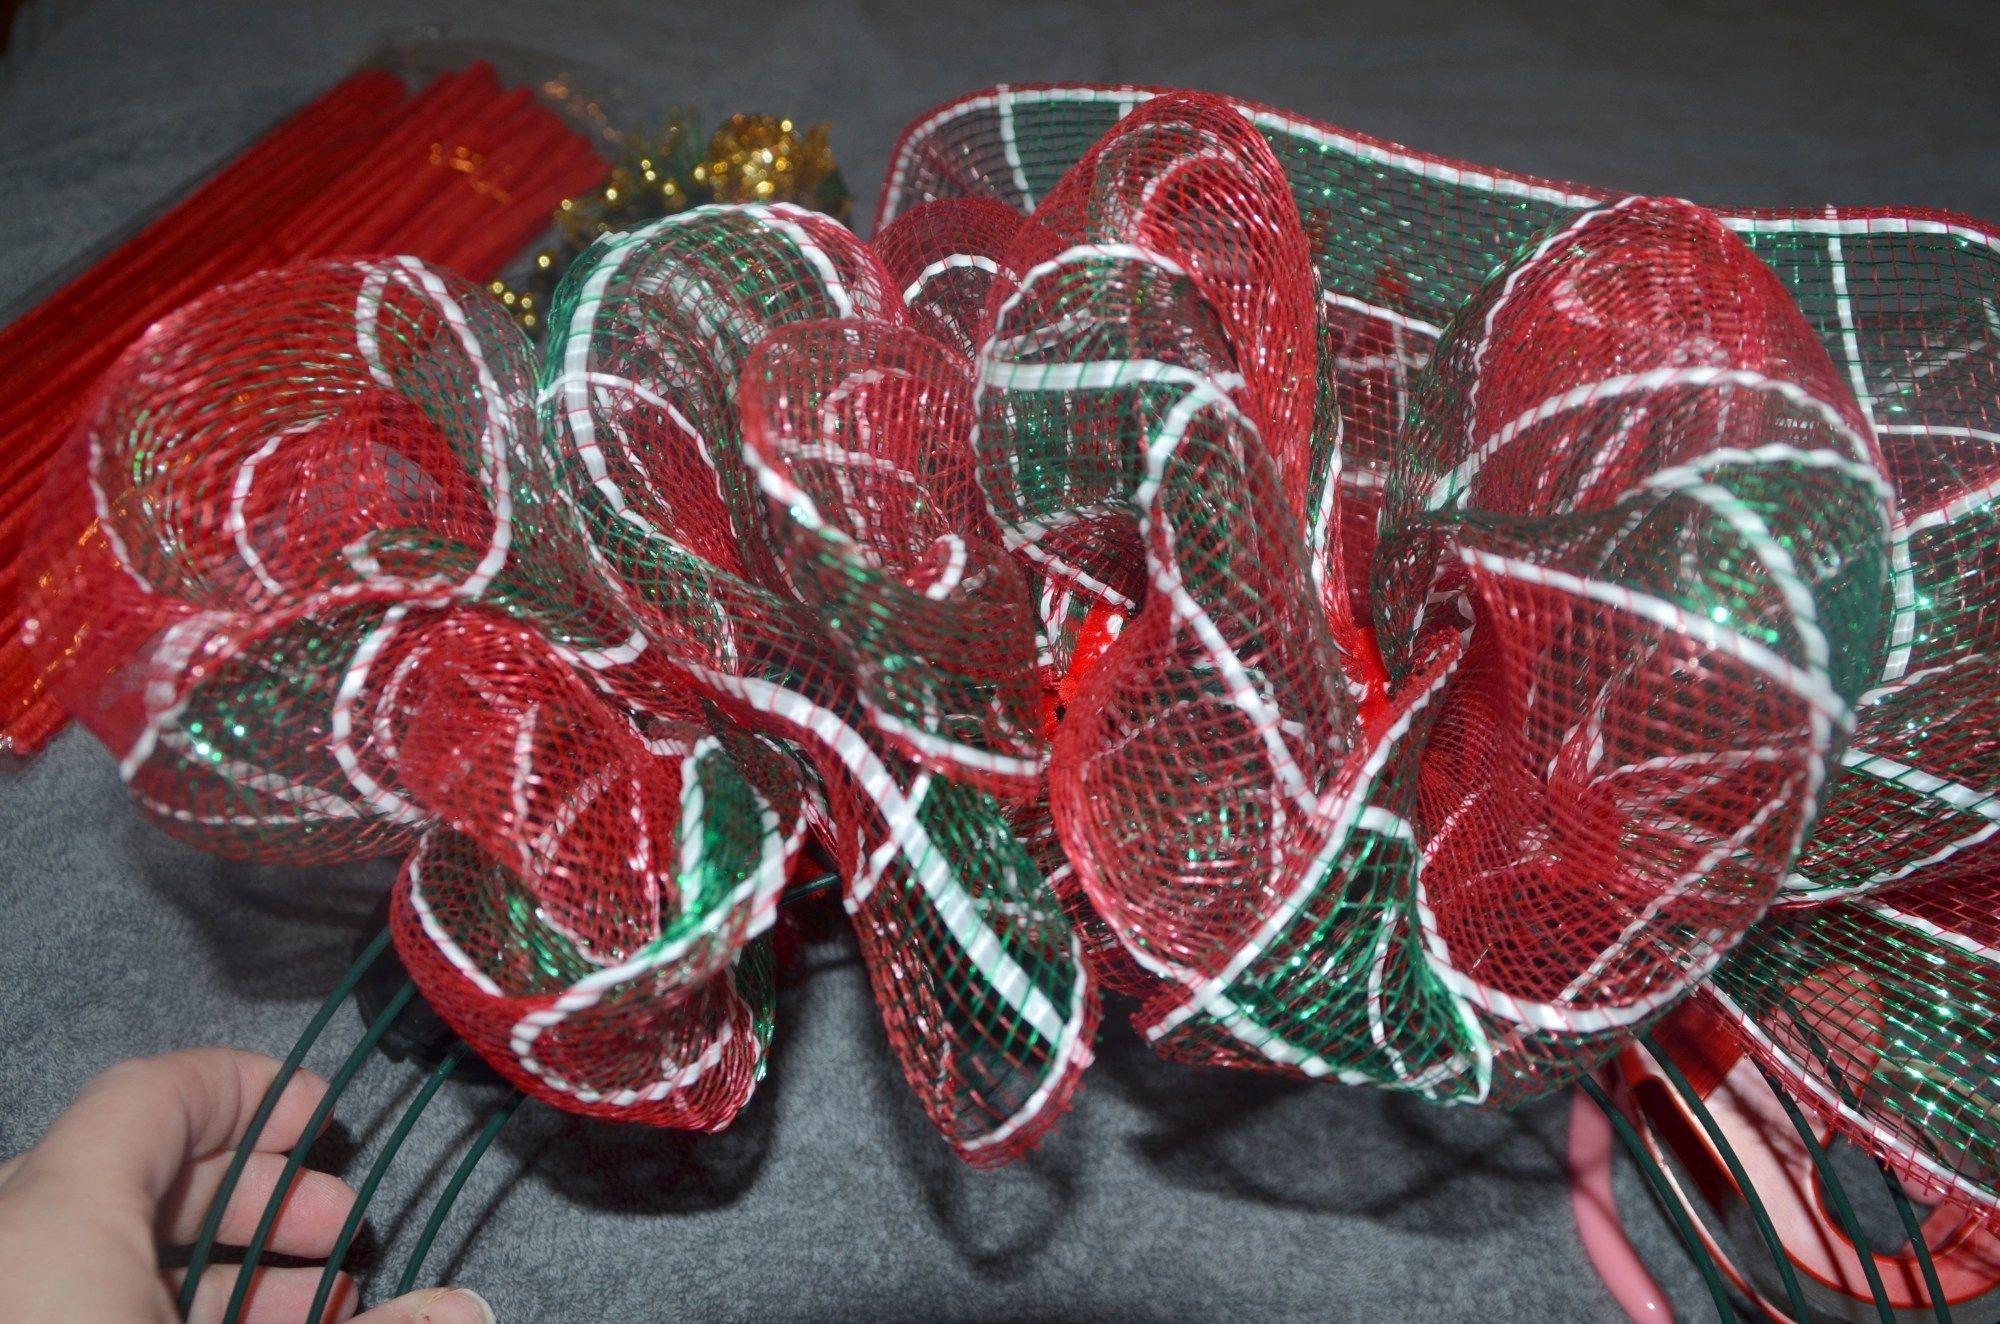 Deco Mesh Christmas Wreath Tutorial #decomeshwreaths